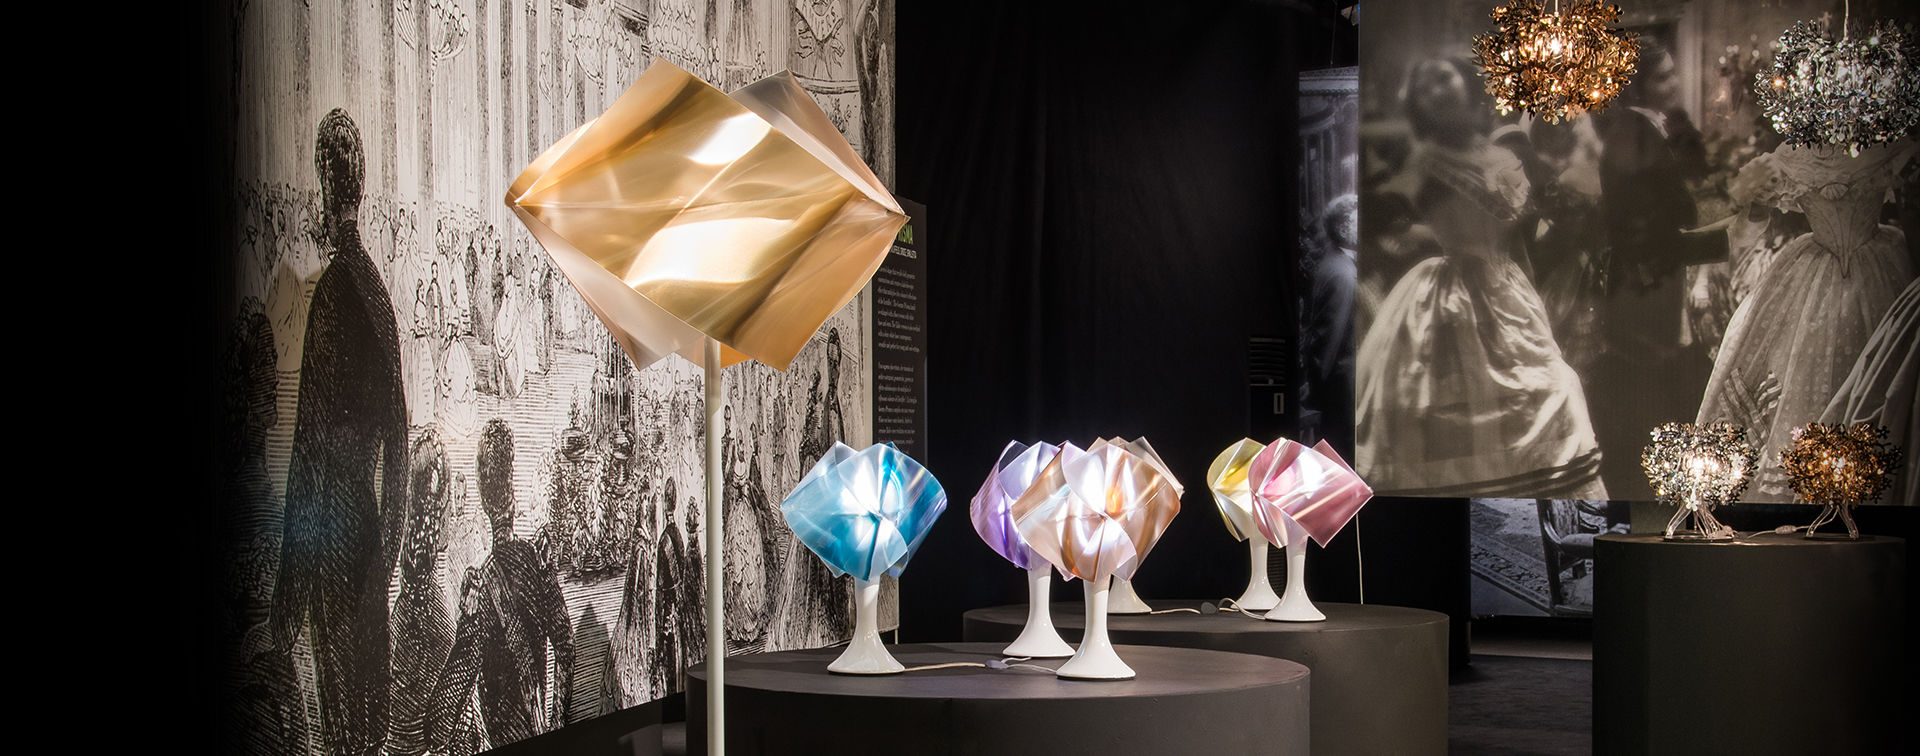 gemmy-prisma-table-ambientata_slide